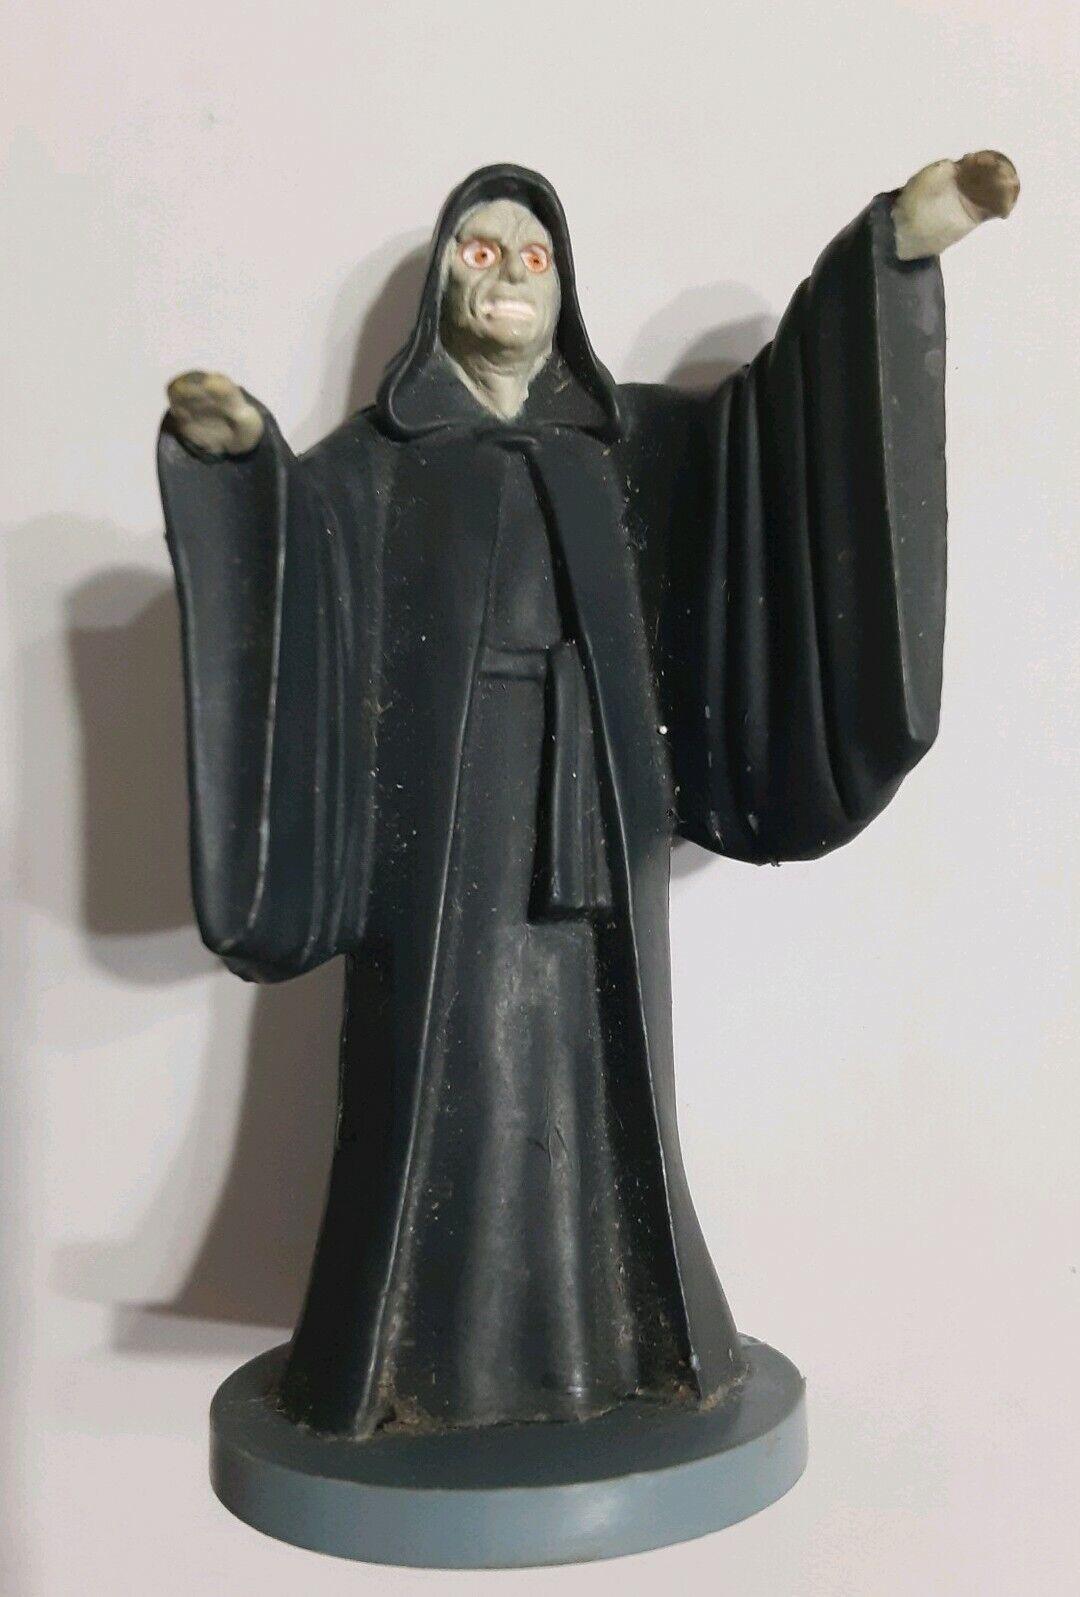 StarWars figurine : Star Wars EMPEROR PALPATINE Cake Topper Figurine  Applause 1996